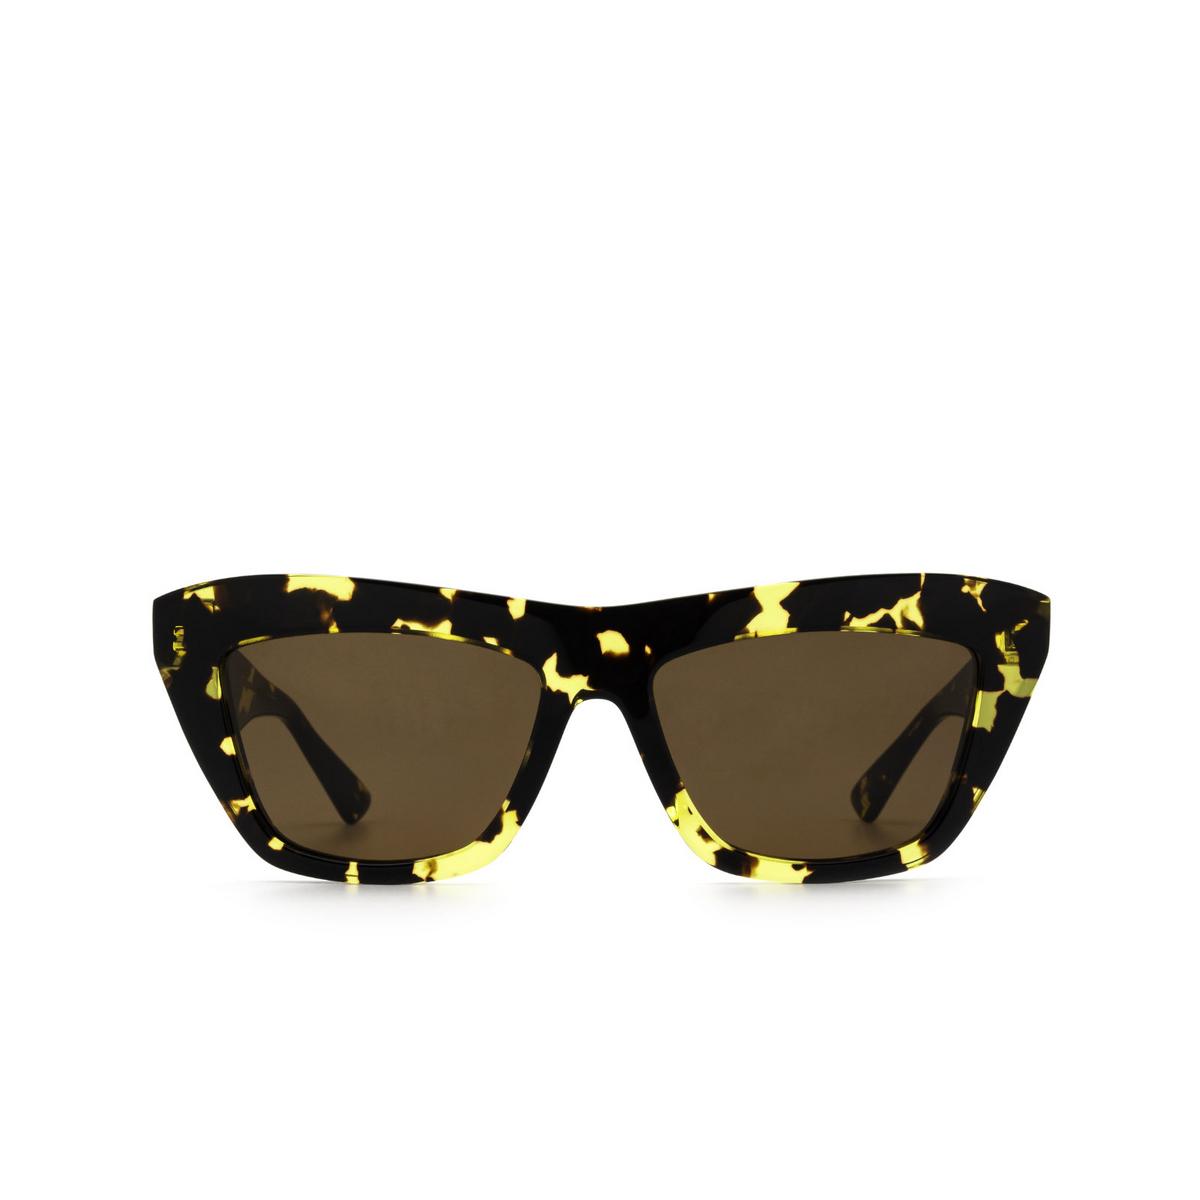 Bottega Veneta® Cat-eye Sunglasses: BV1121S color Havana 002 - front view.